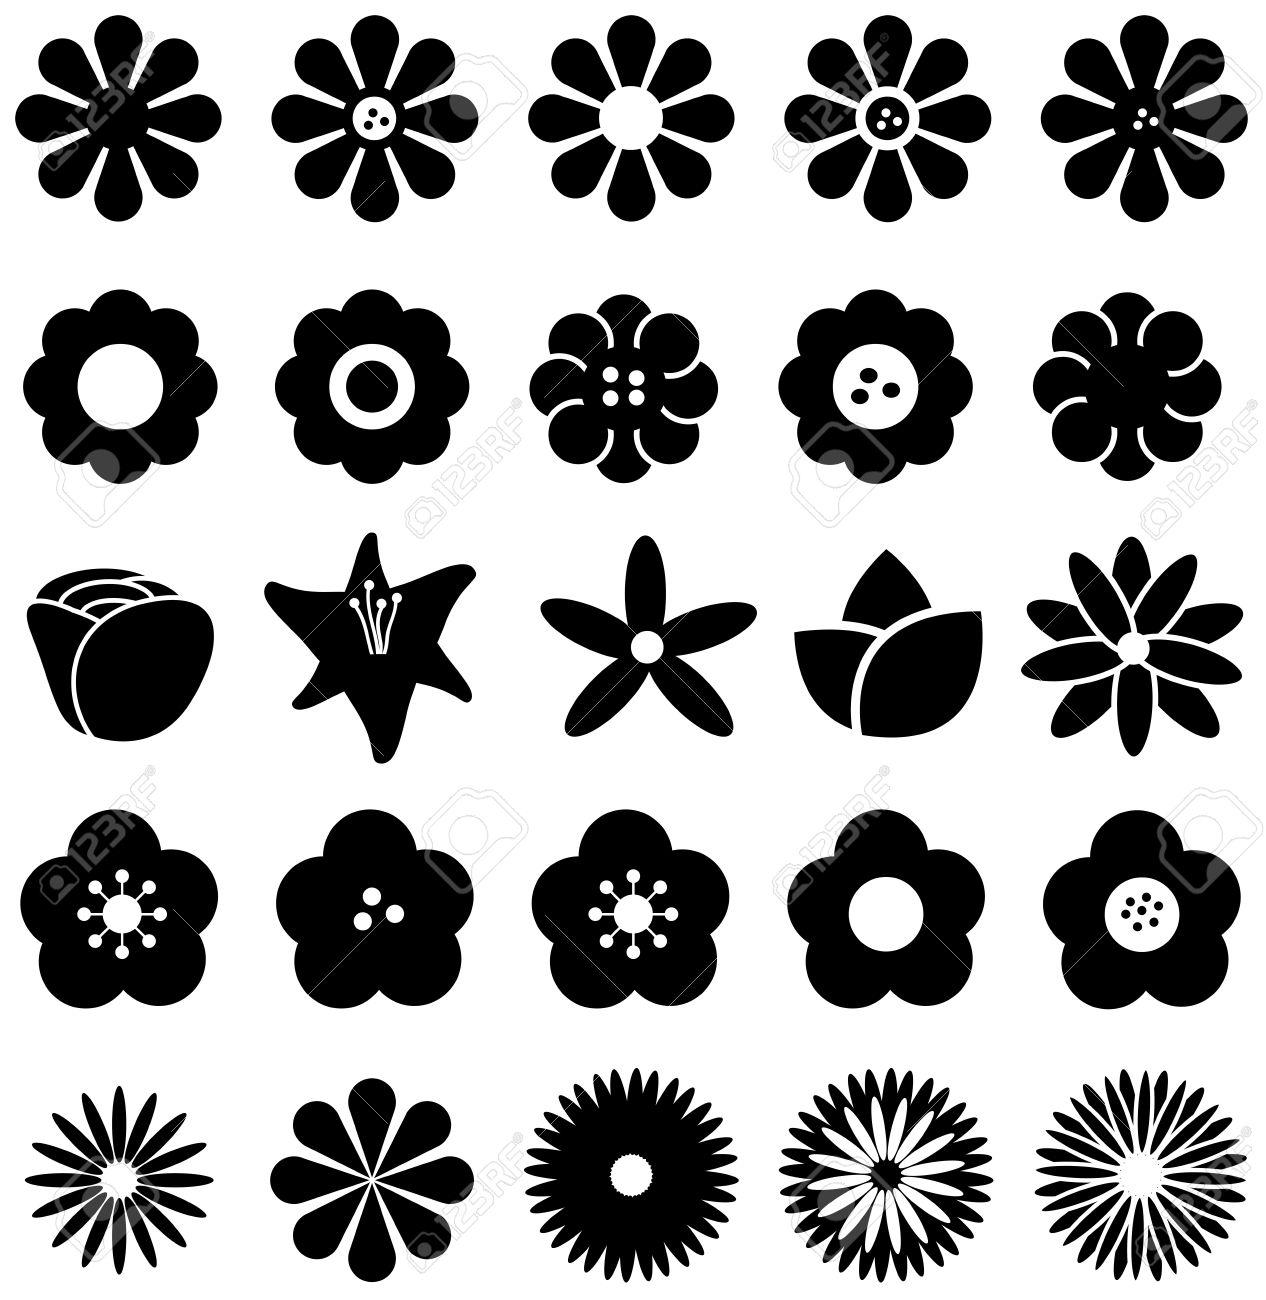 Großzügig Sonnenblumenblatt Vorlage Fotos - Entry Level Resume ...